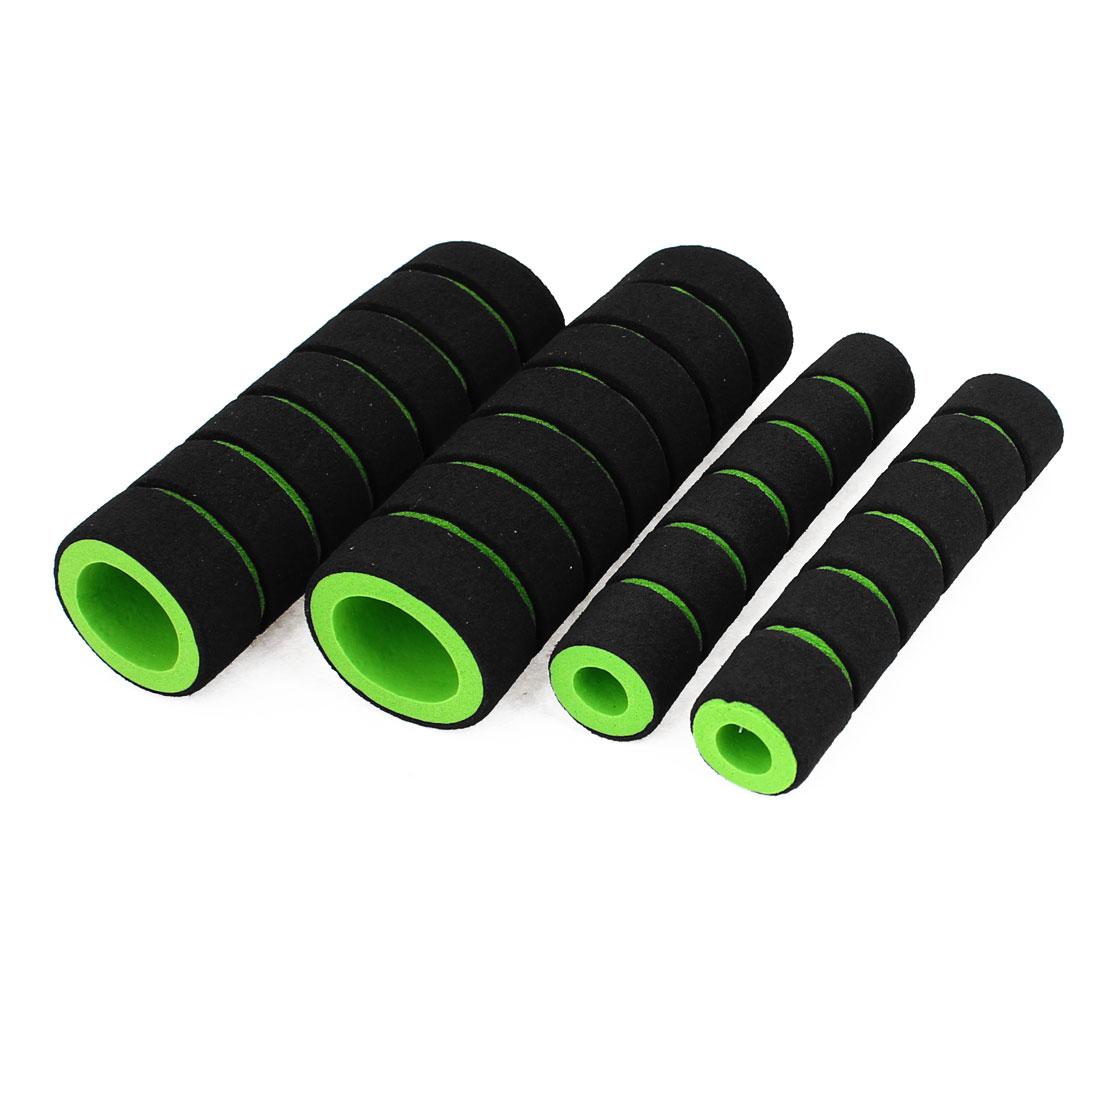 4 x Autobike Motorbike Foam Non-Slip Hand Grips Cover Black Green